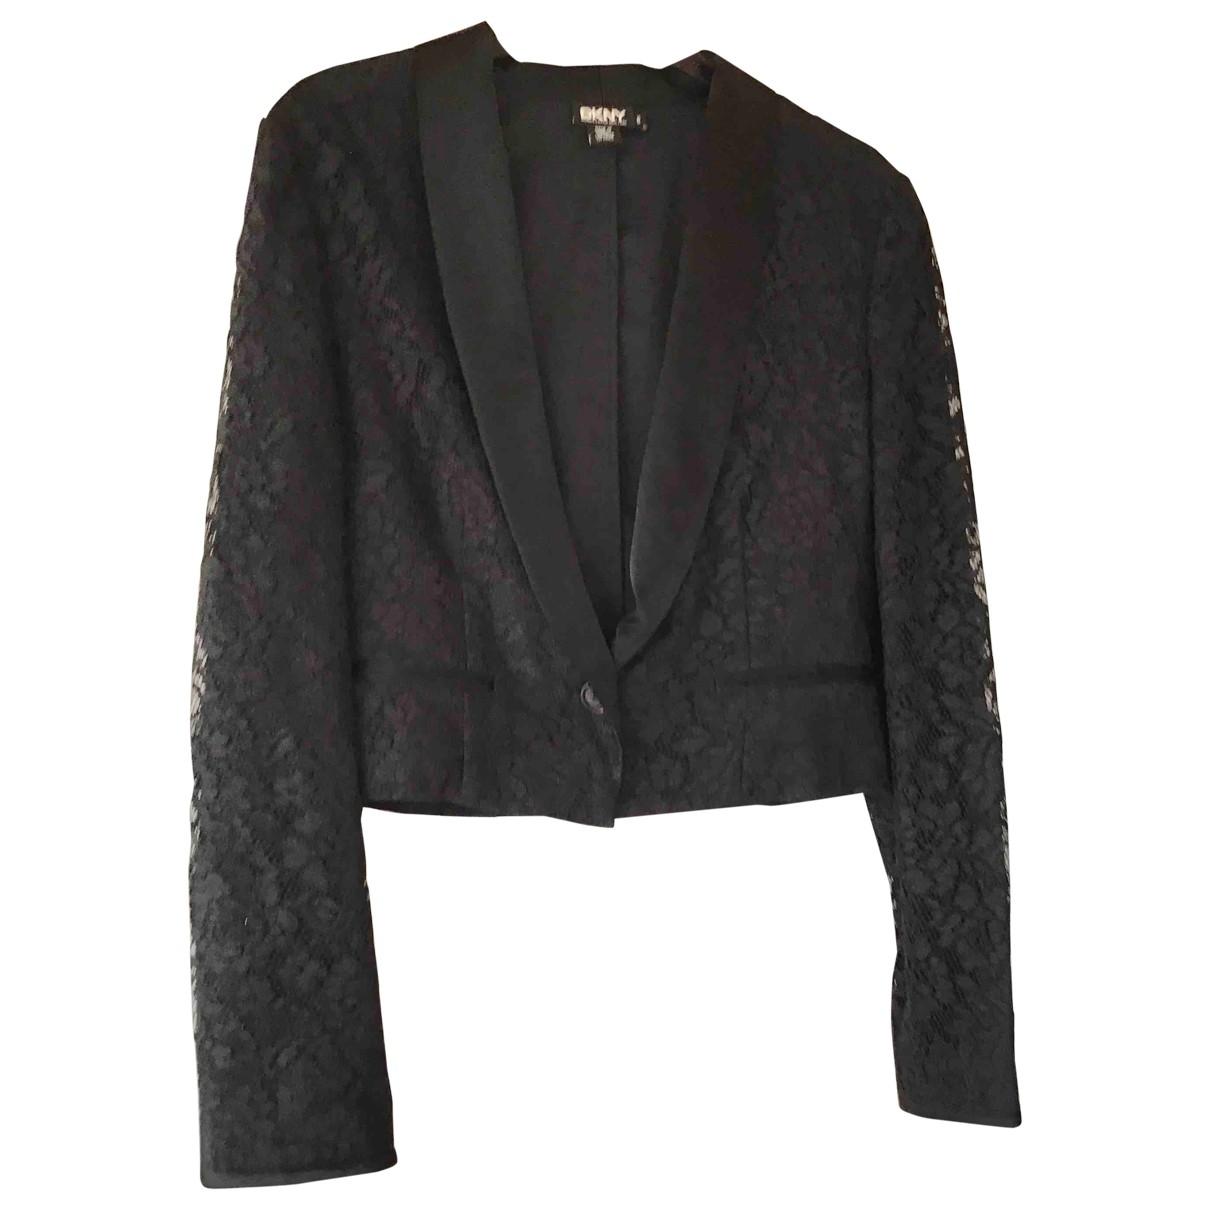 Dkny \N Black jacket for Women 6 US